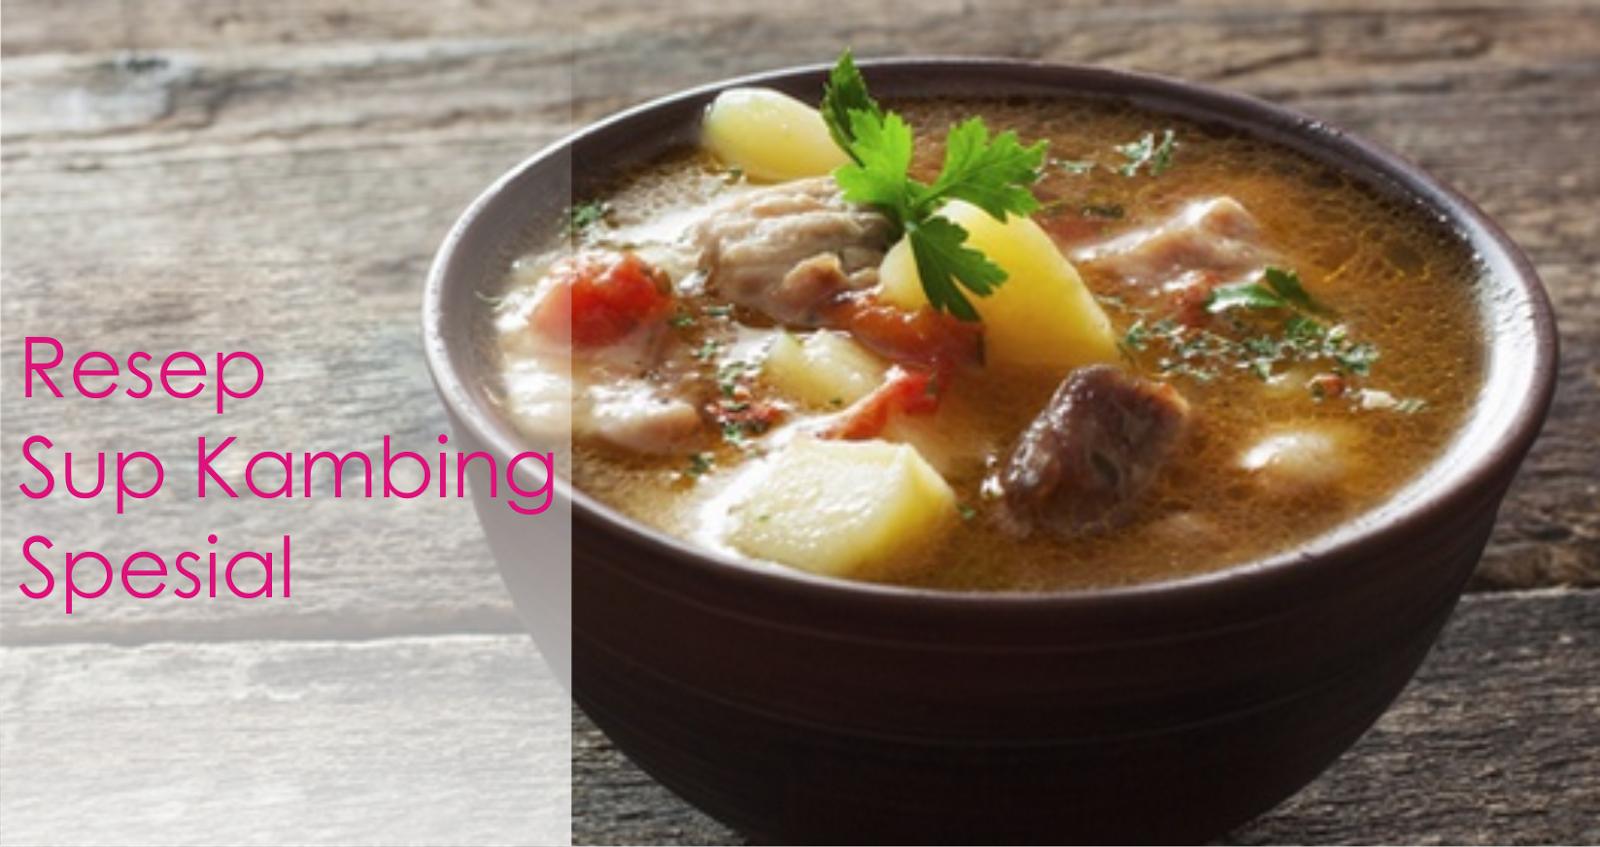 Resep Sup Untuk Bayi Resep Masakan Indonesia Praktis